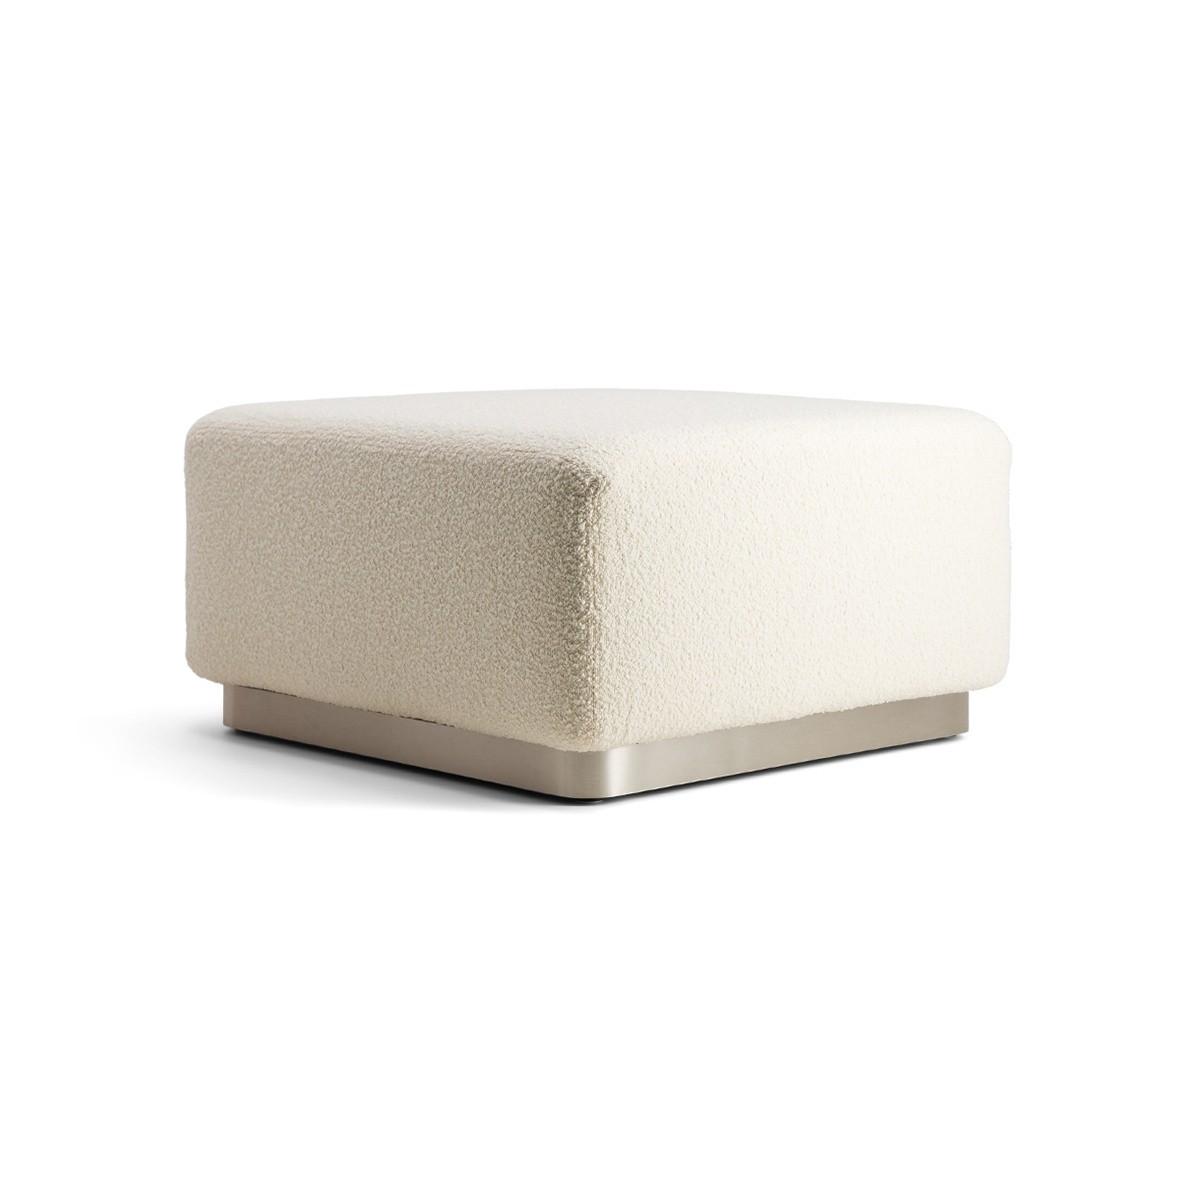 Rotondo Footstool in Cream White Curly Wool